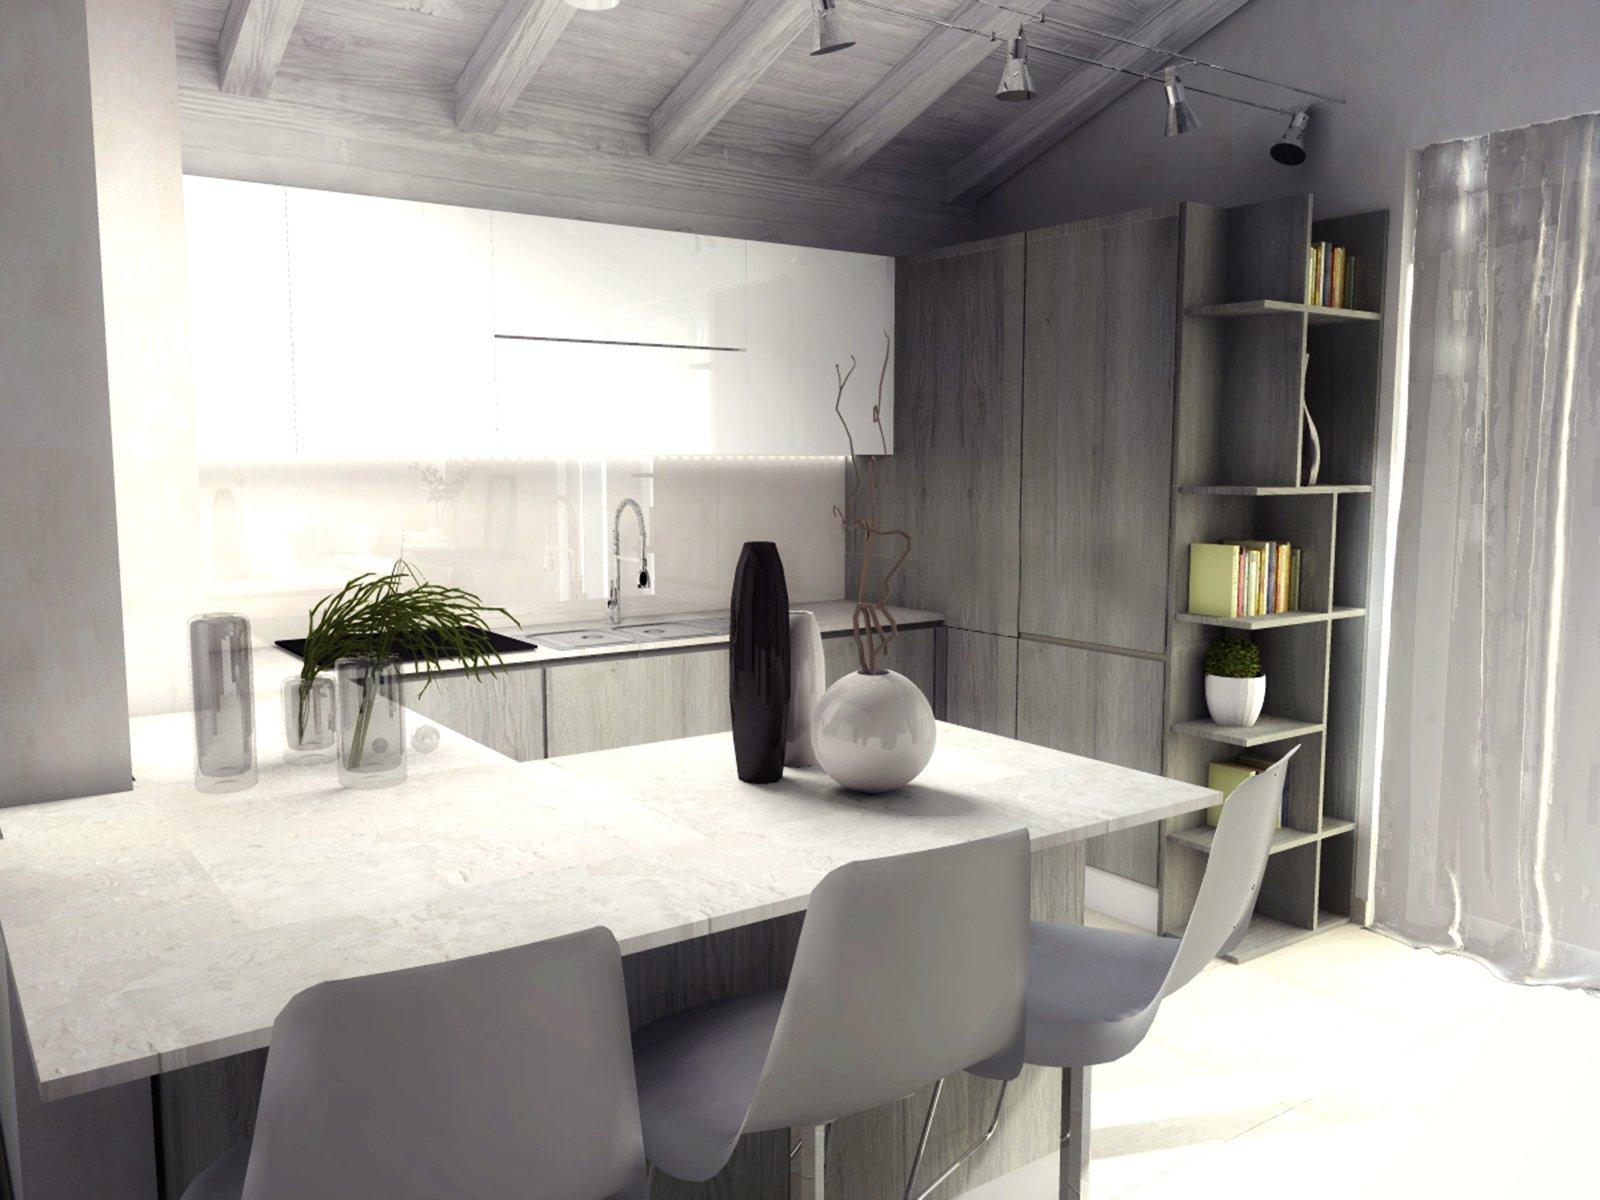 Mansardate Cucina In Mansarda Arredamento Camera Da Letto In Mansar ...